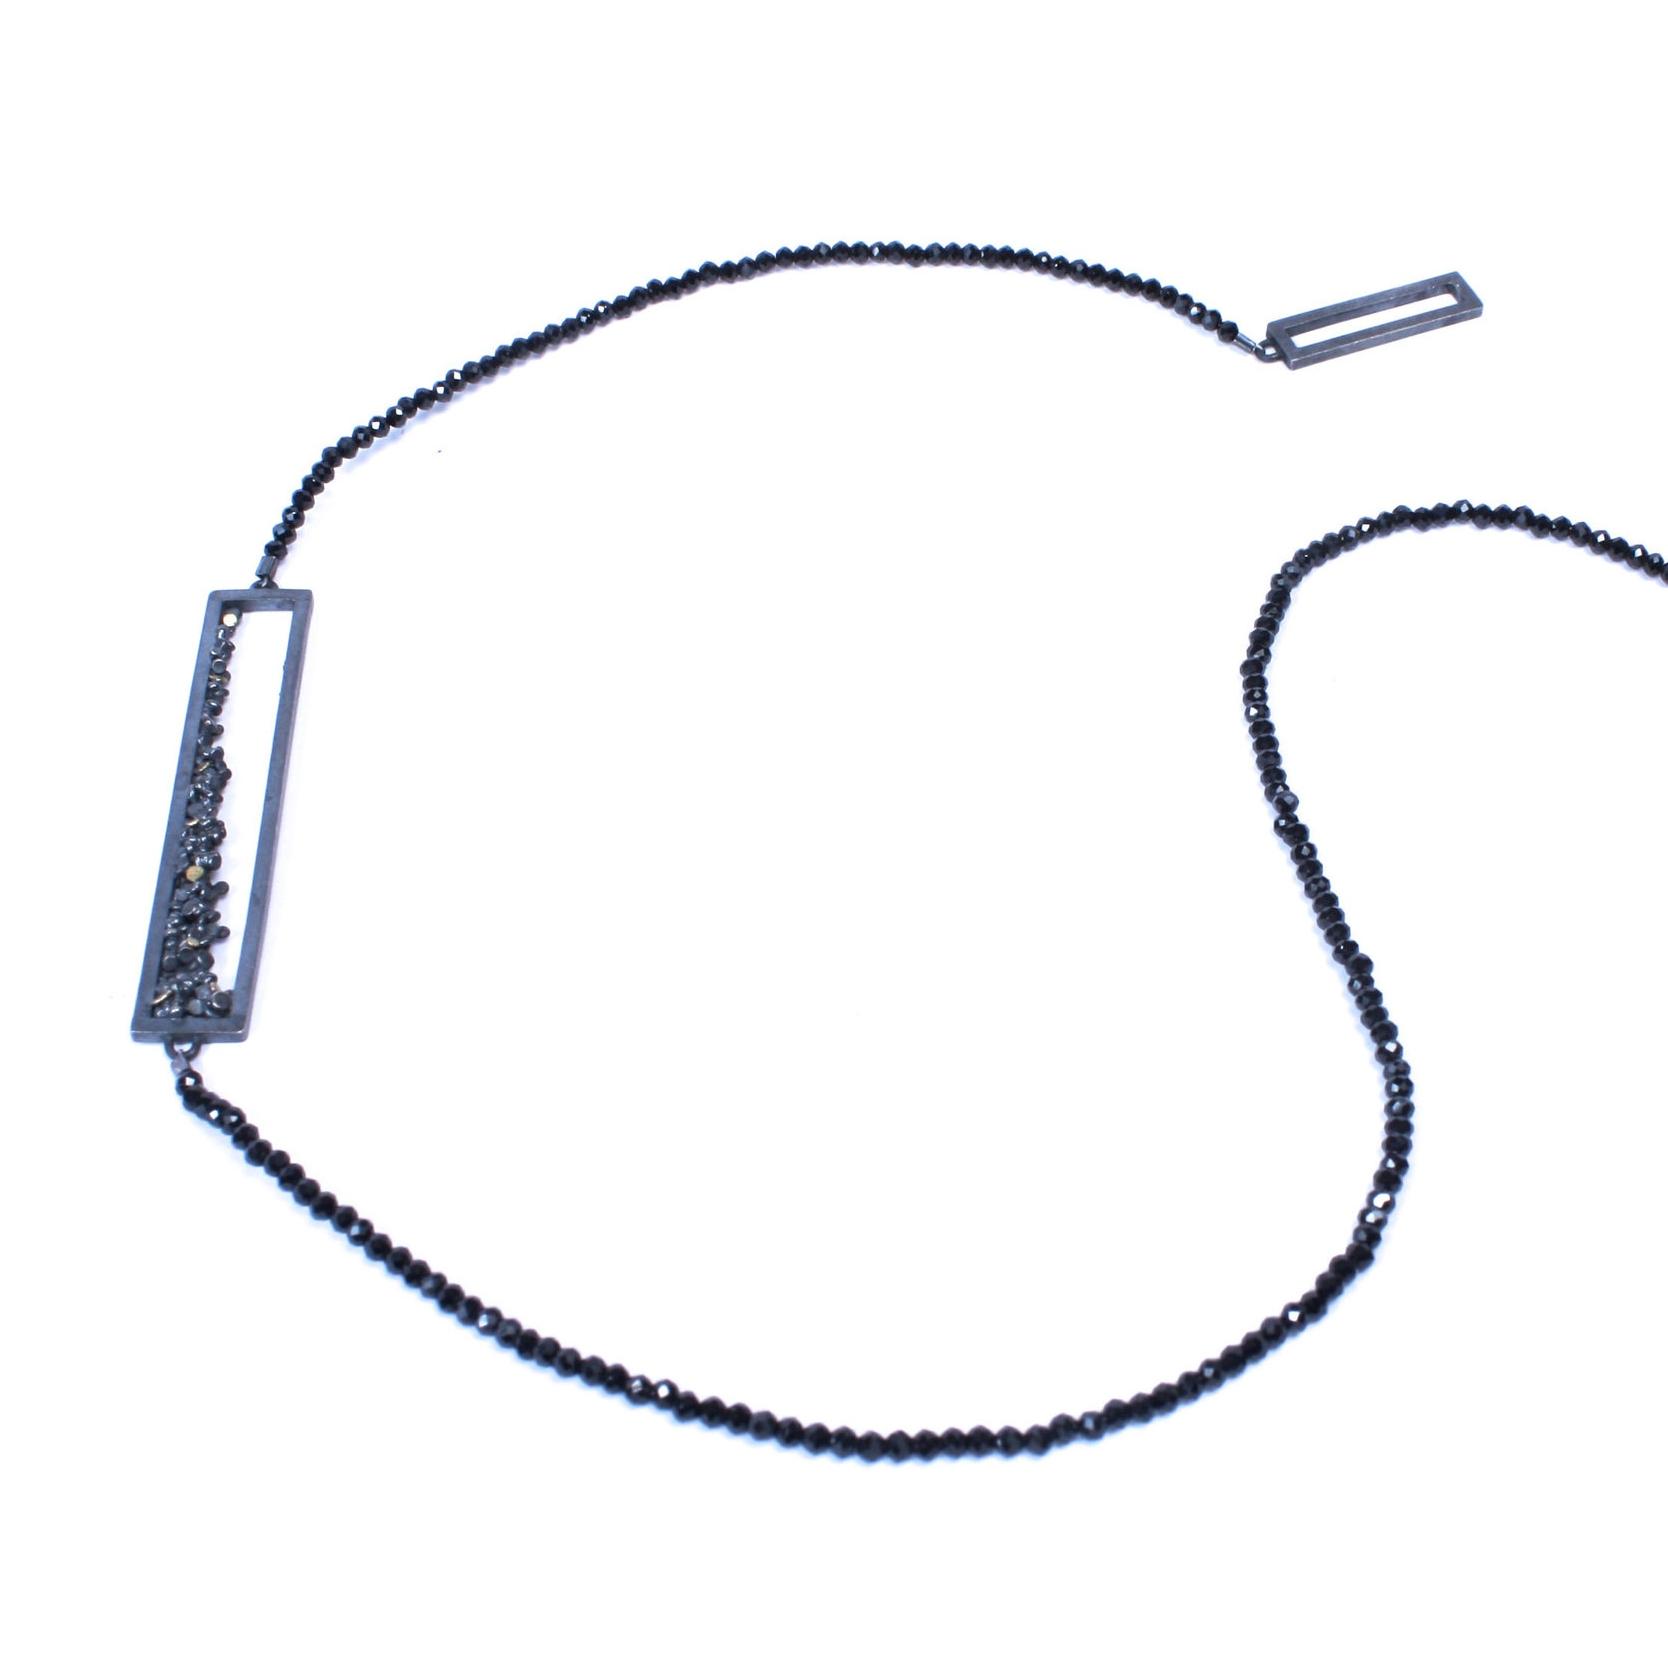 Speckle Spinel Necklace